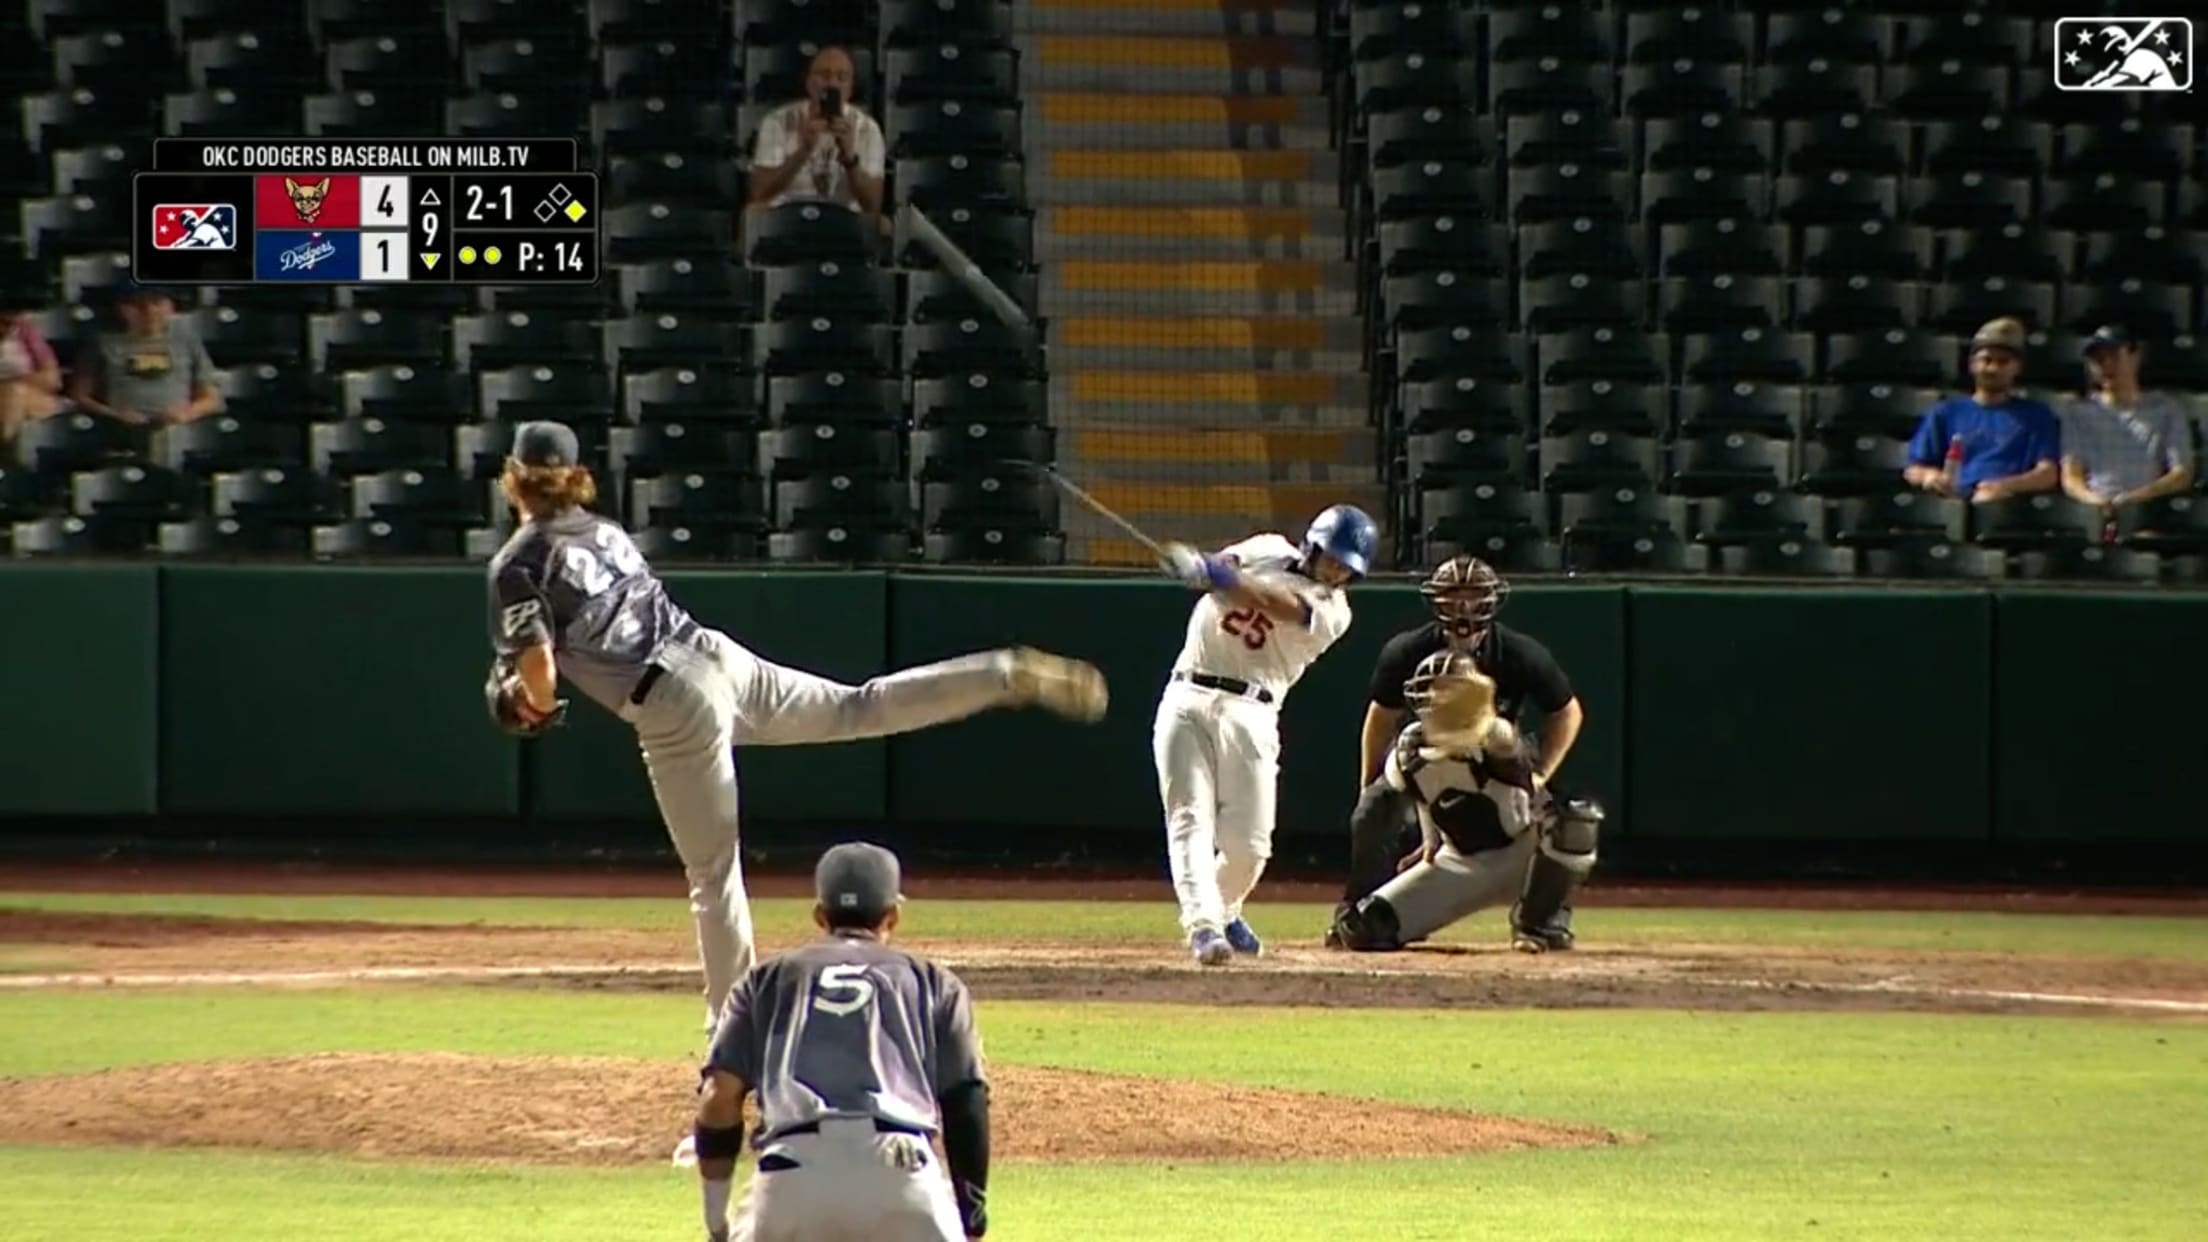 Ruiz crushes seventh home run